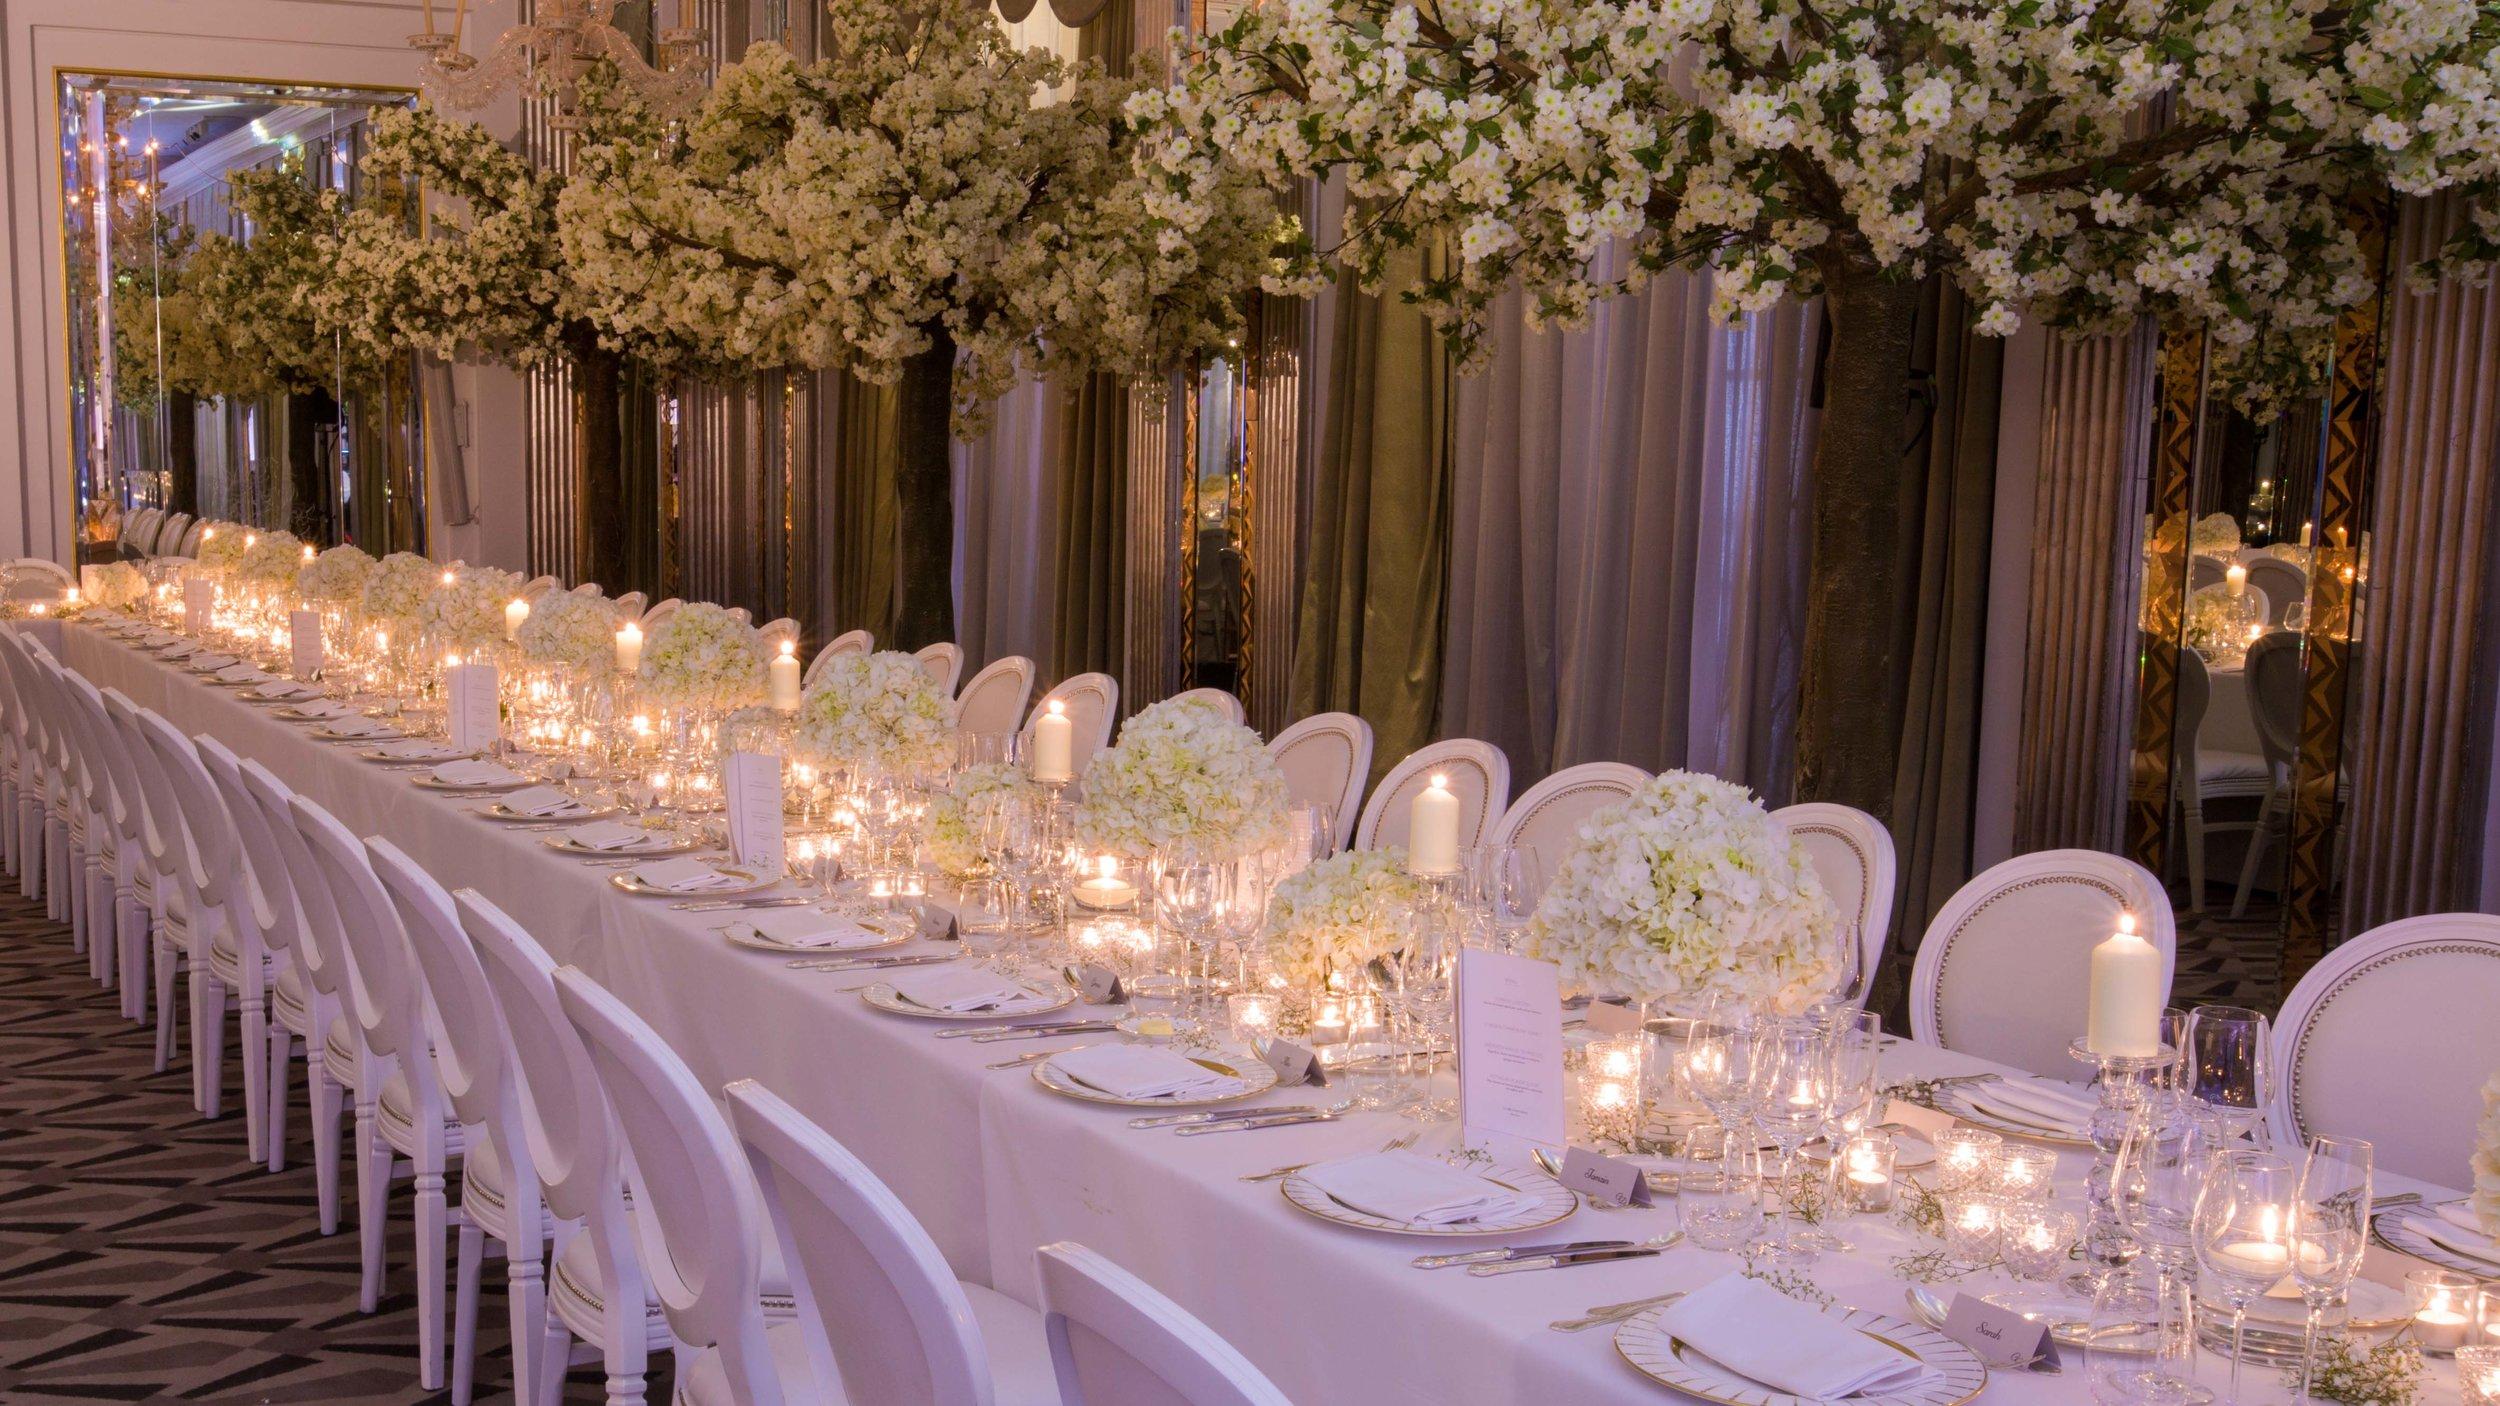 claridges-hotel-wedding-photographer-london-mayfair-natalia-smith-photography-89.jpg